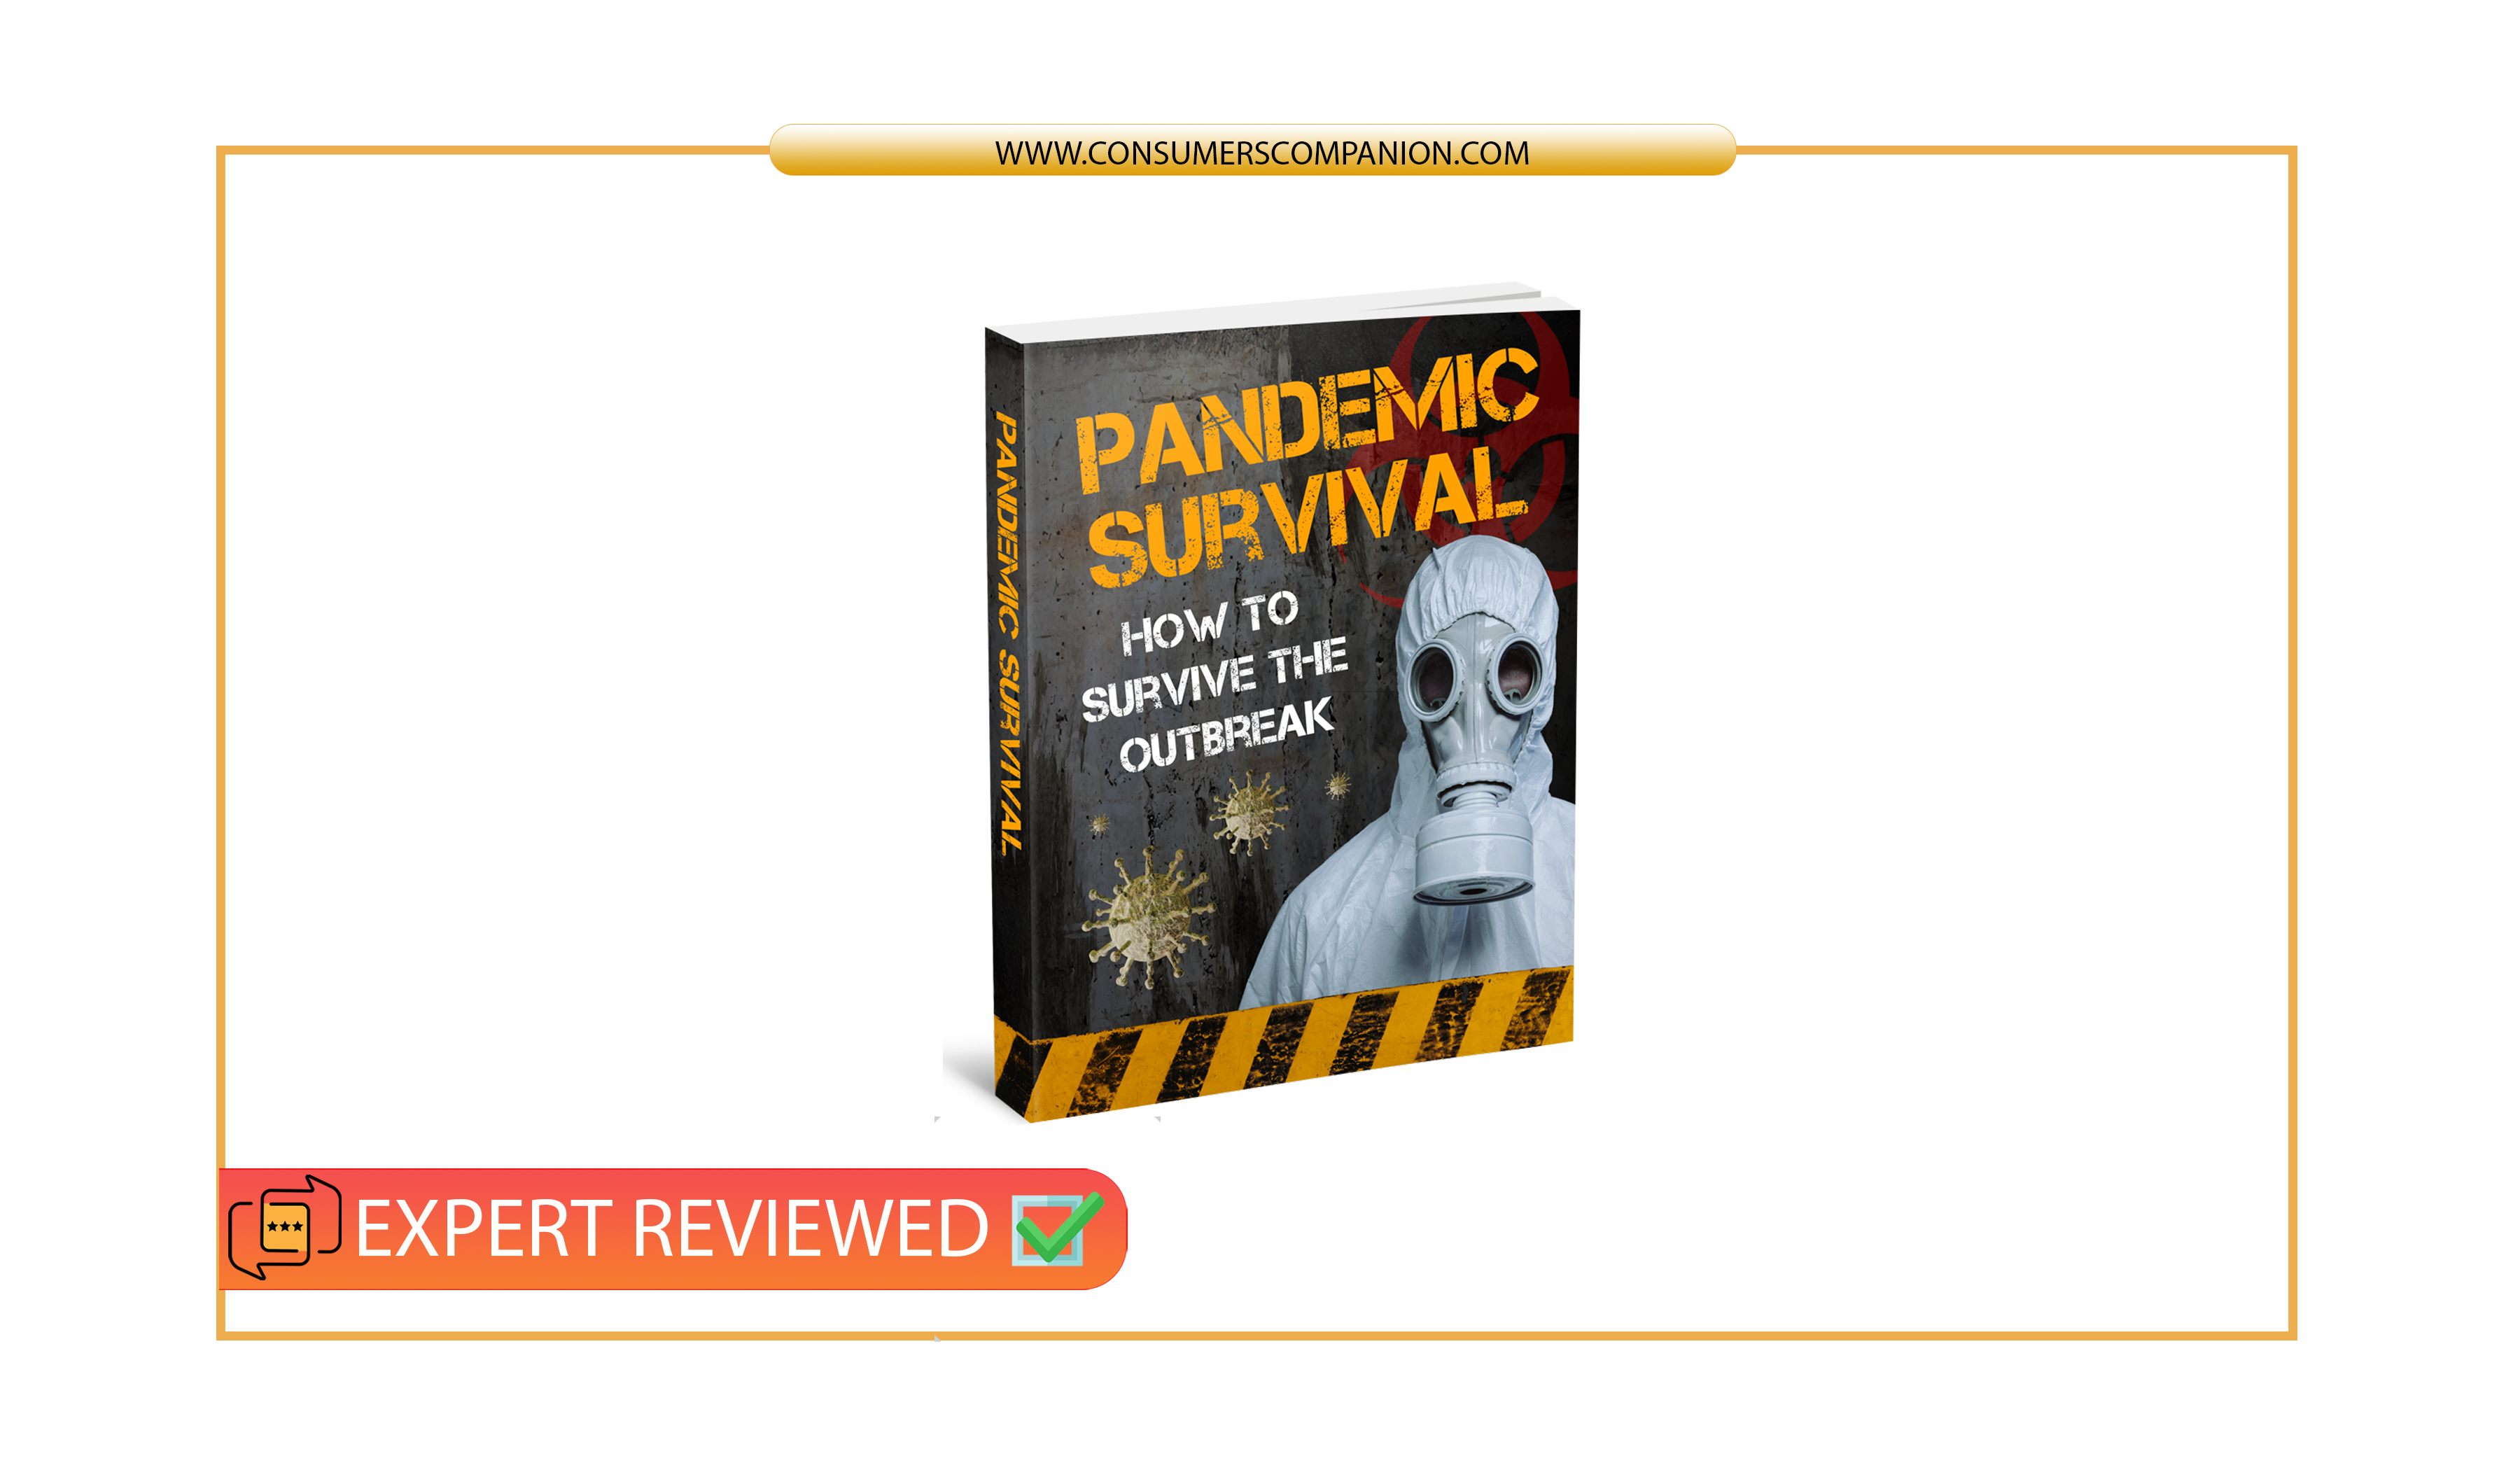 Pandemic Survival Guide Reviews